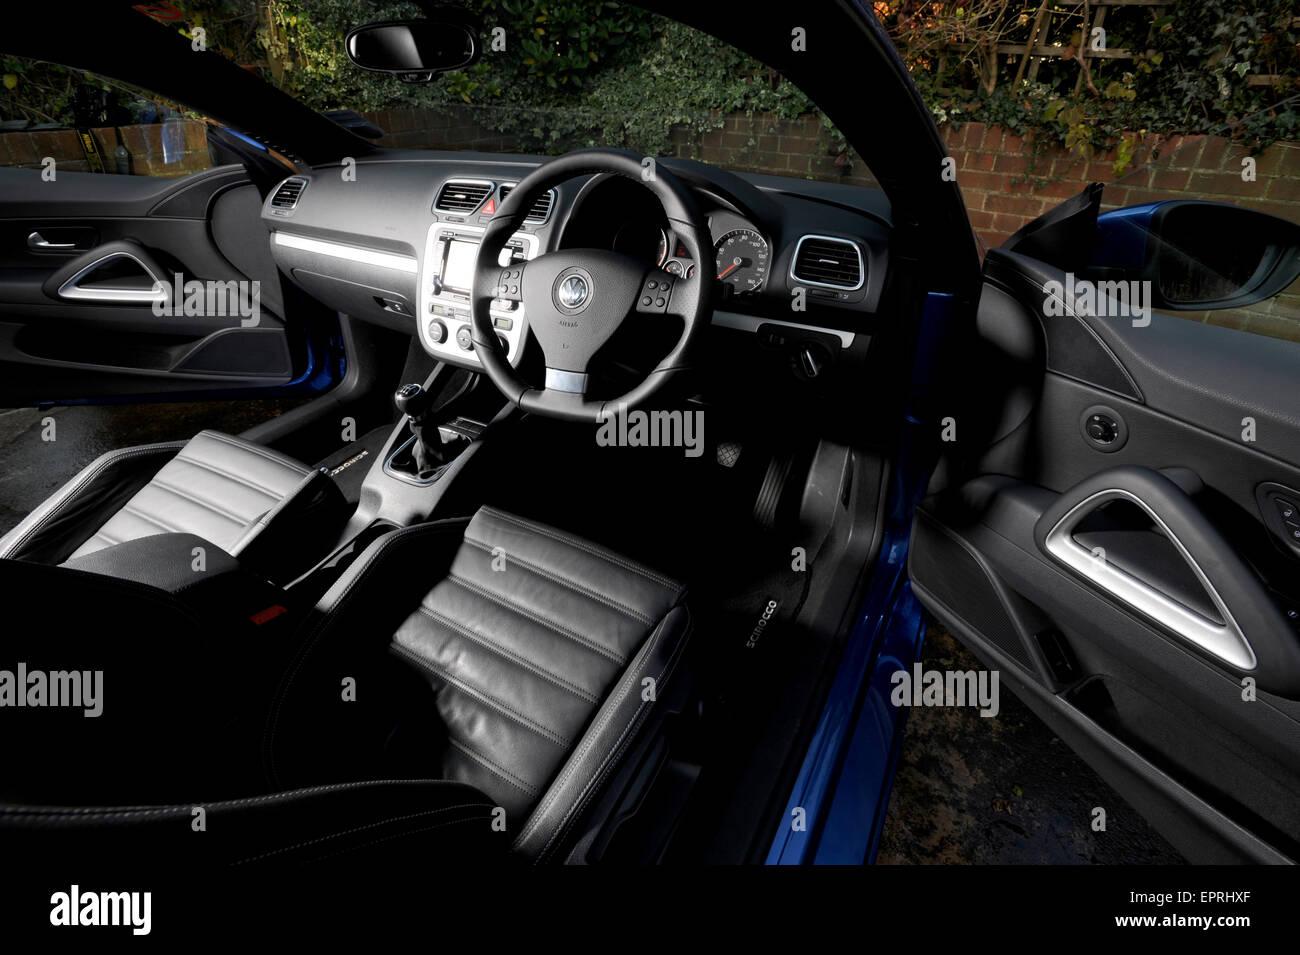 https://c8.alamy.com/comp/EPRHXF/2008-vw-scirocco-sports-coupe-interior-EPRHXF.jpg